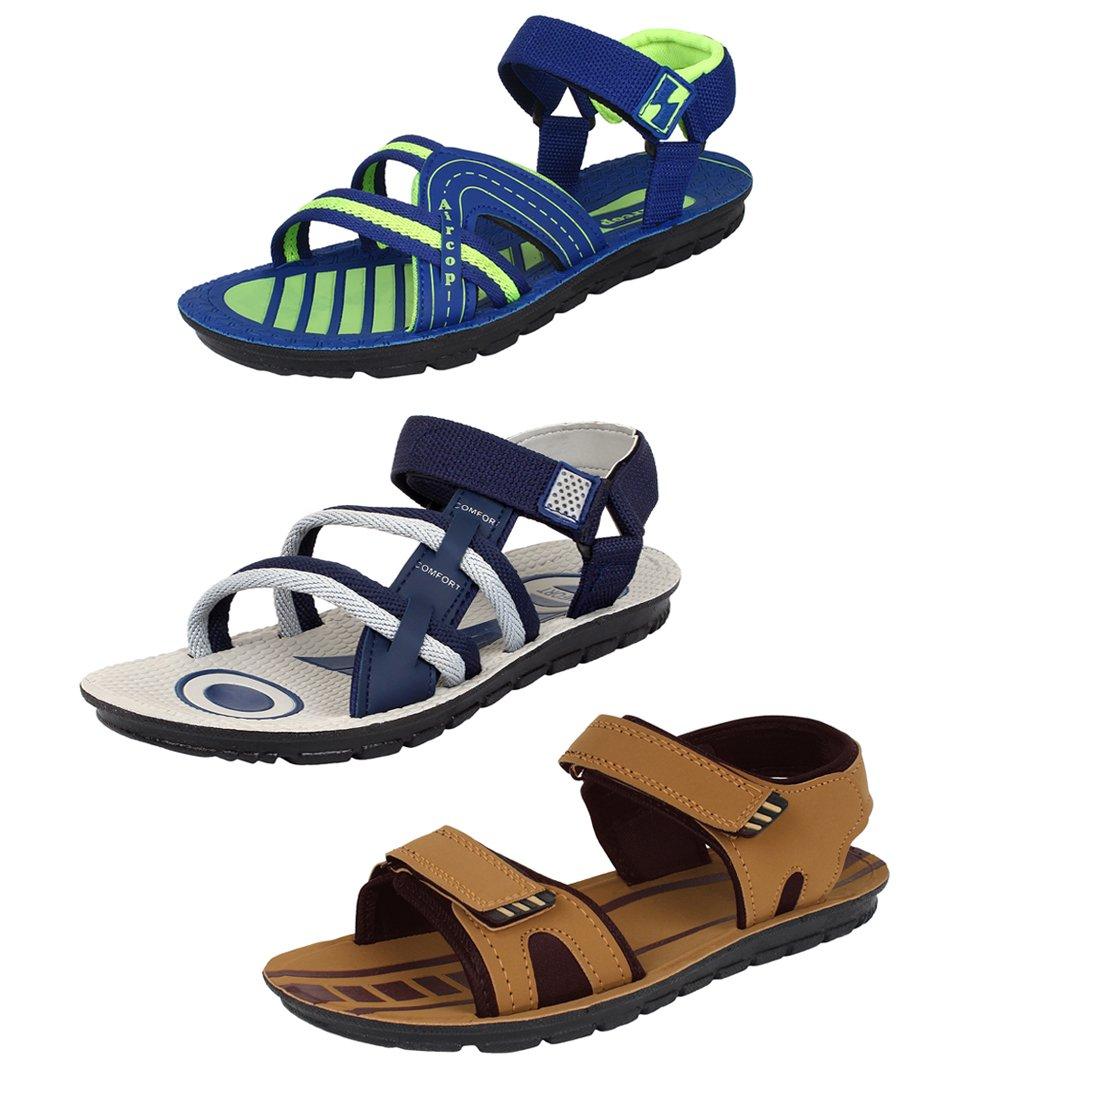 8d0680b4e5147 Super Men's Multicolor Sandals